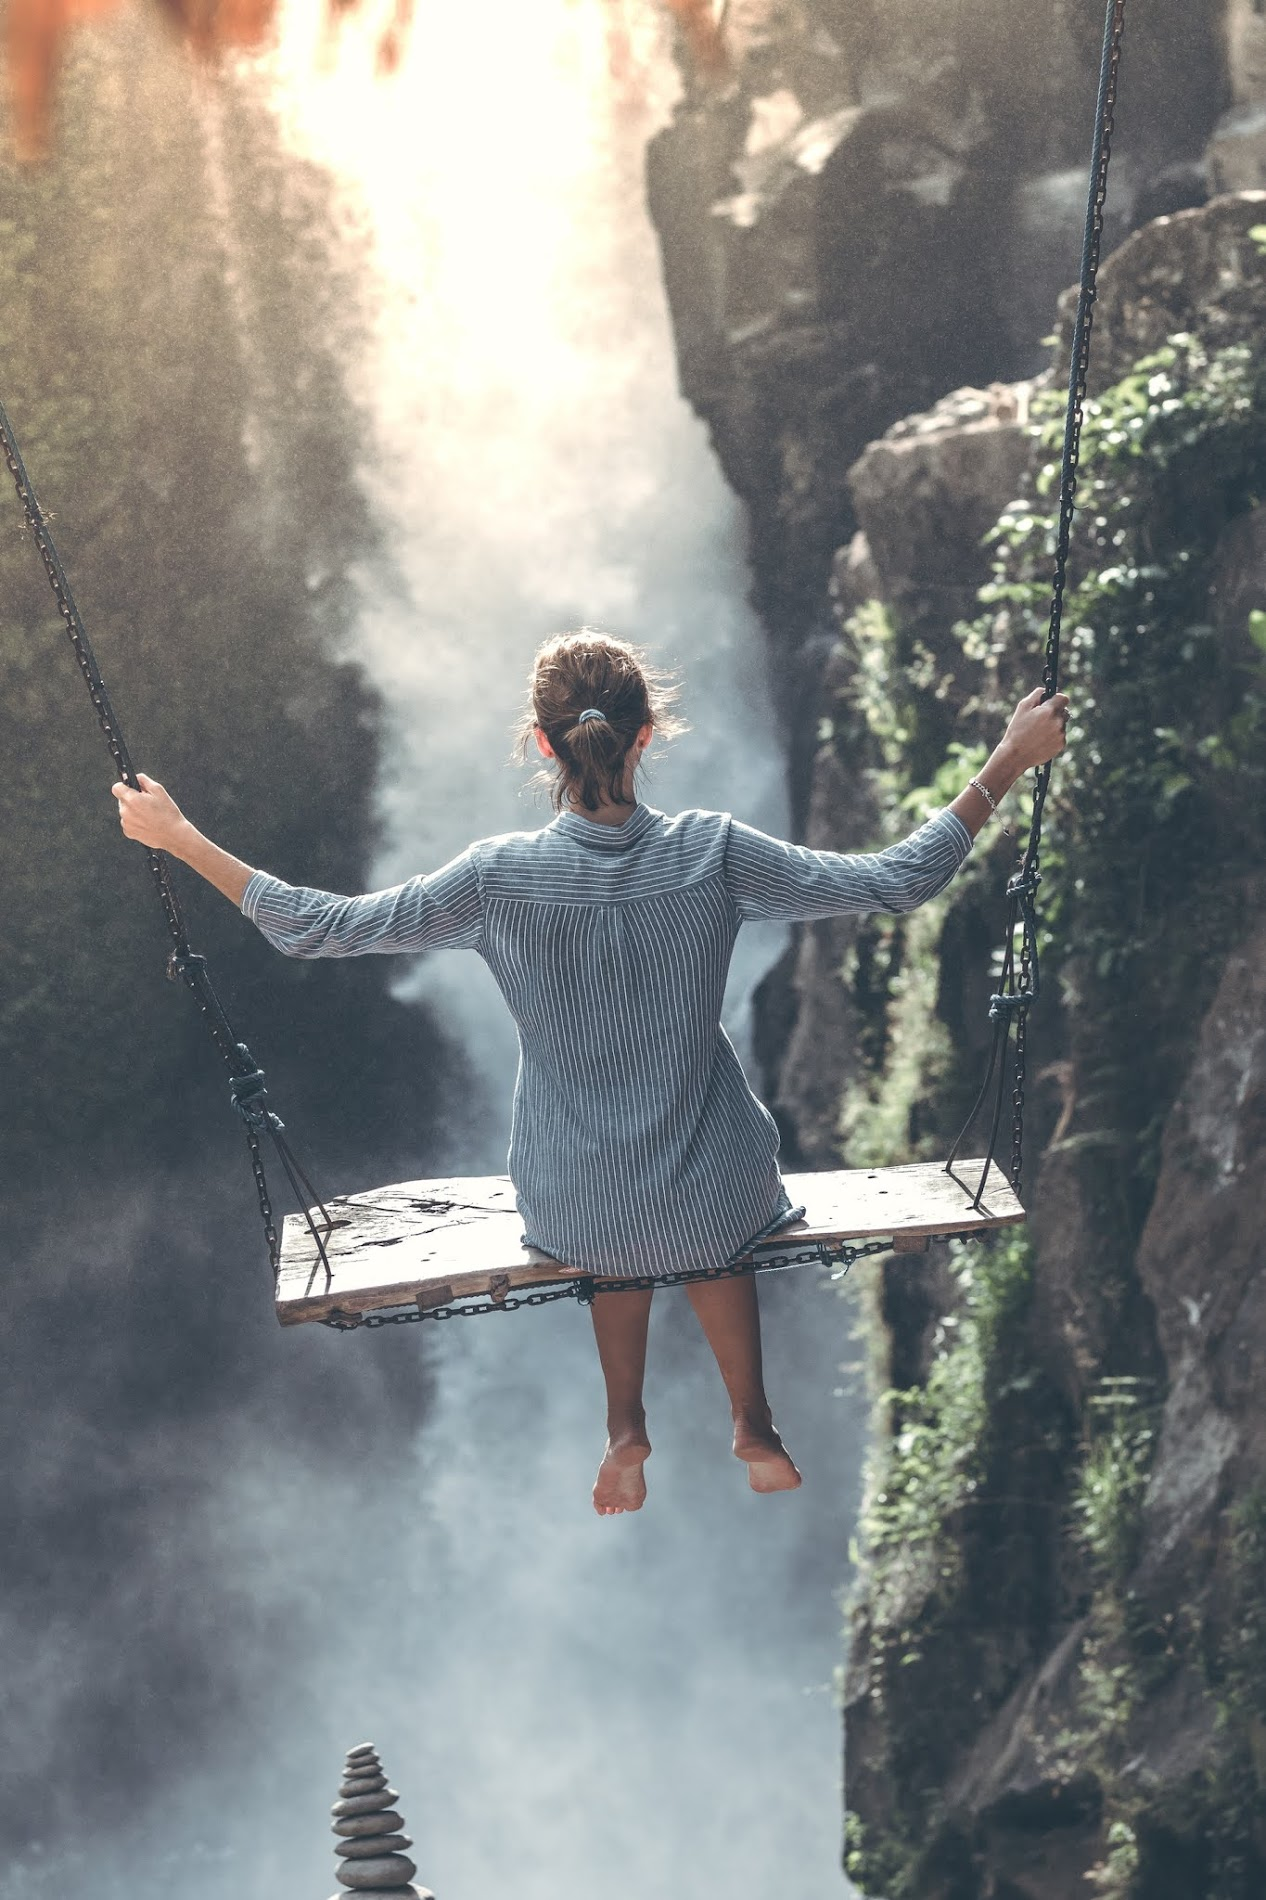 Girl adventure Picture